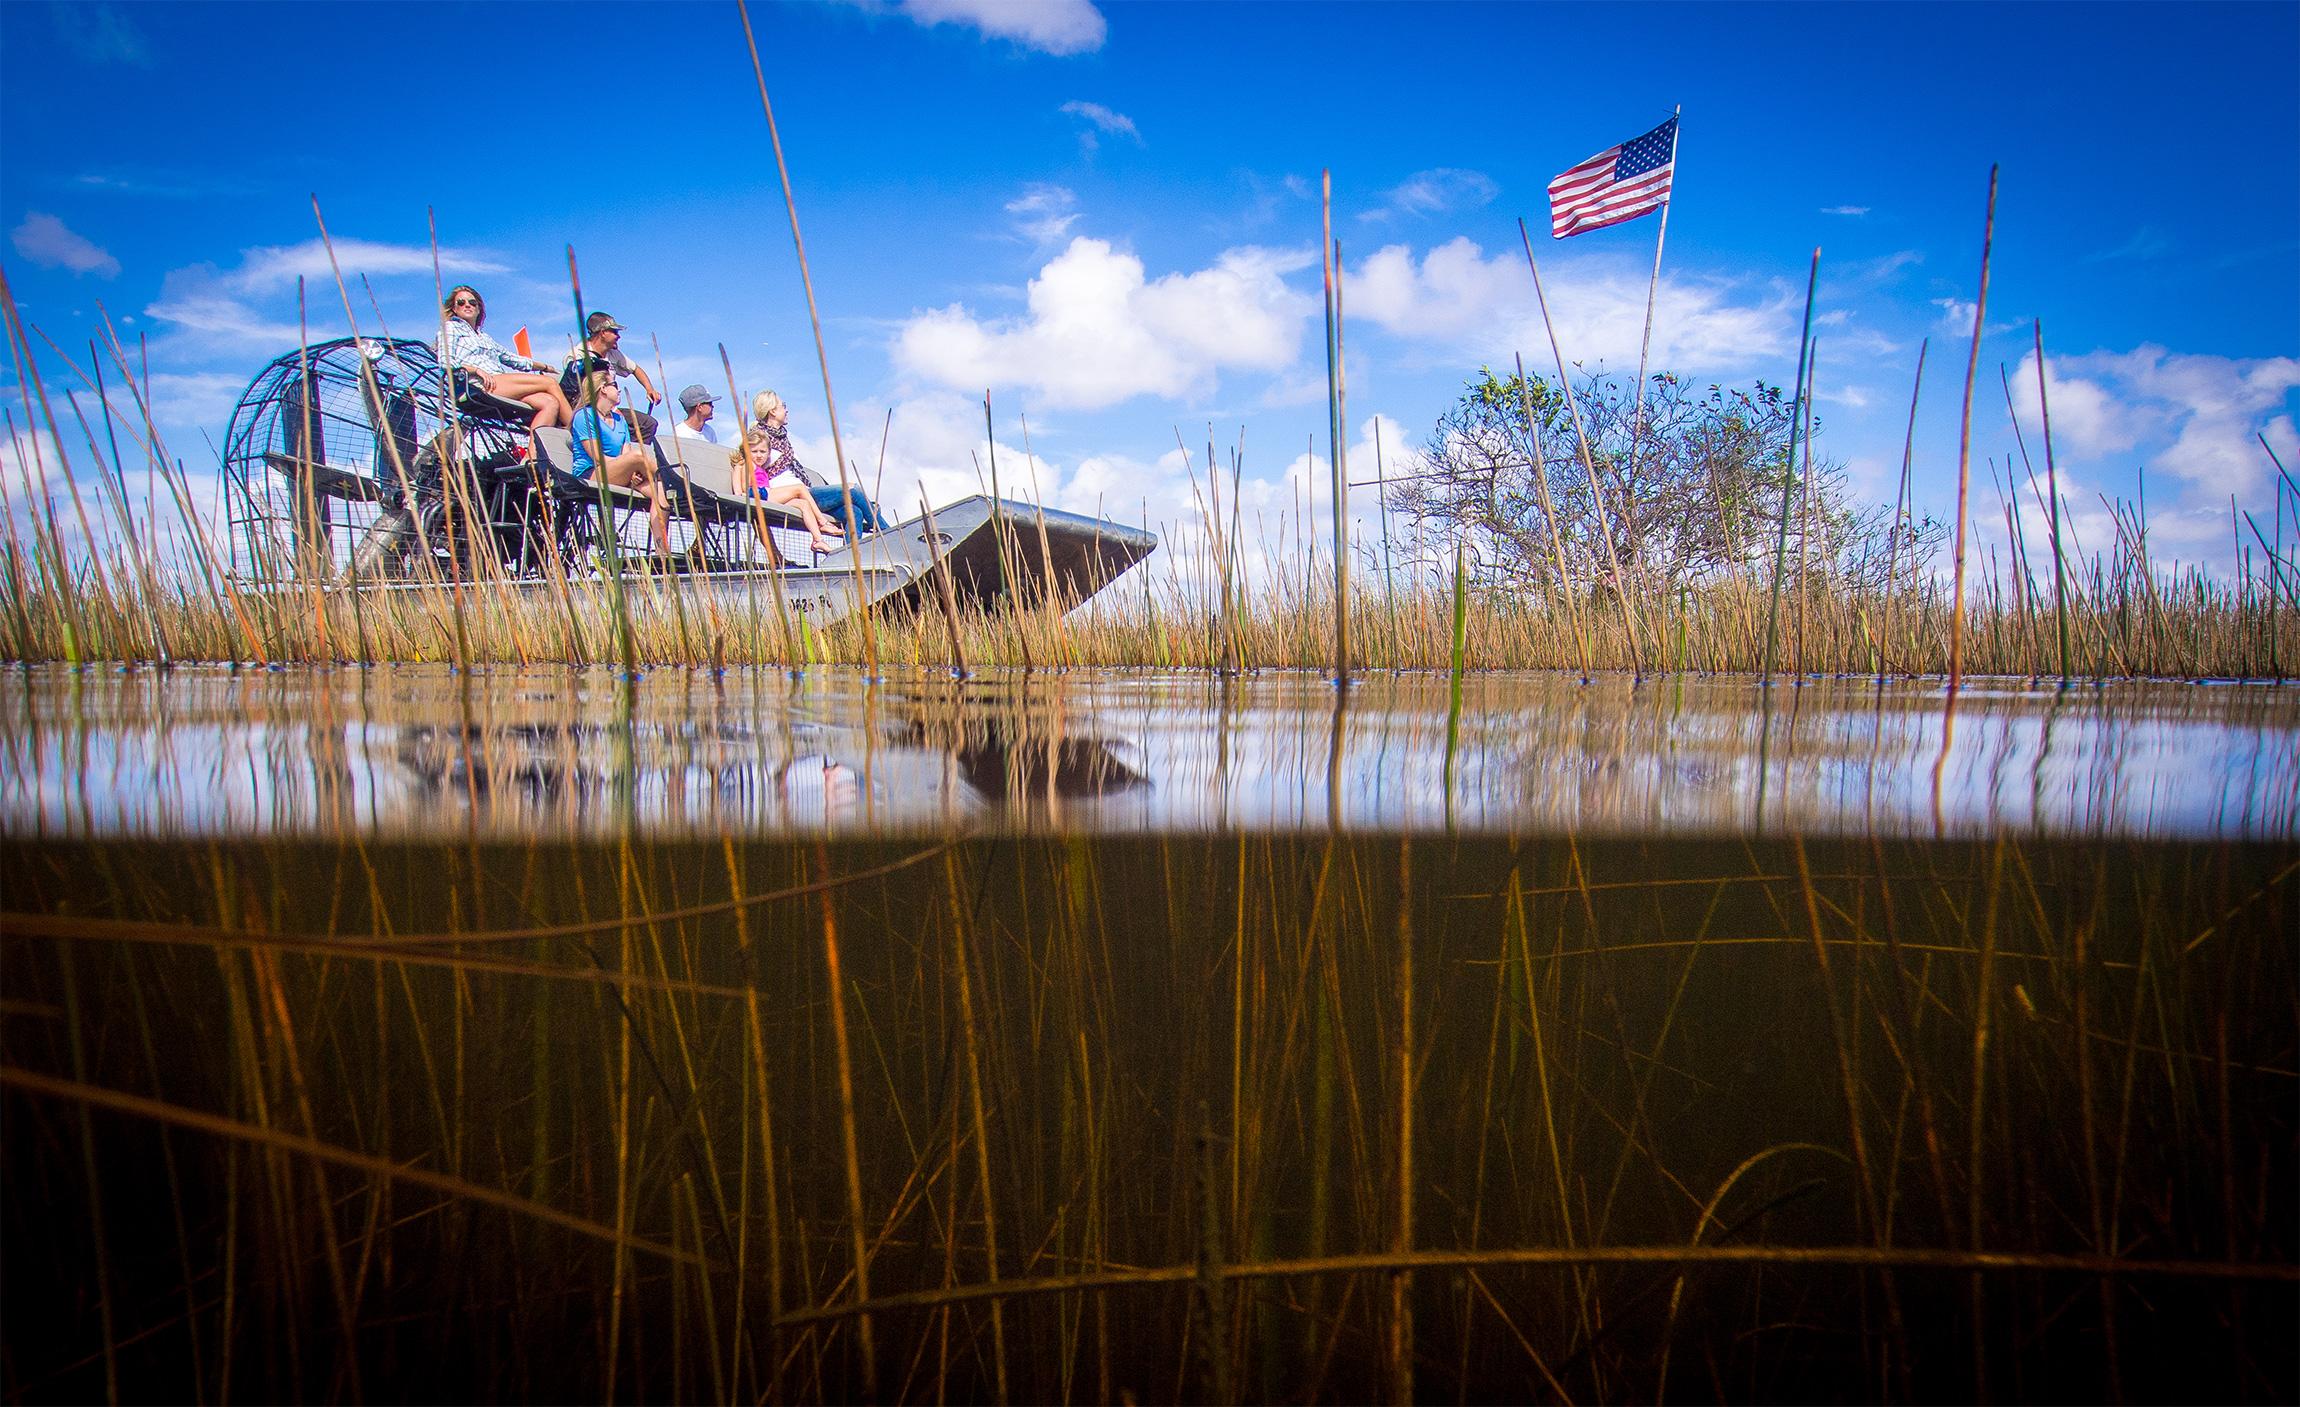 Florida Airboat Rides at Gator Park - Everglades Airboat